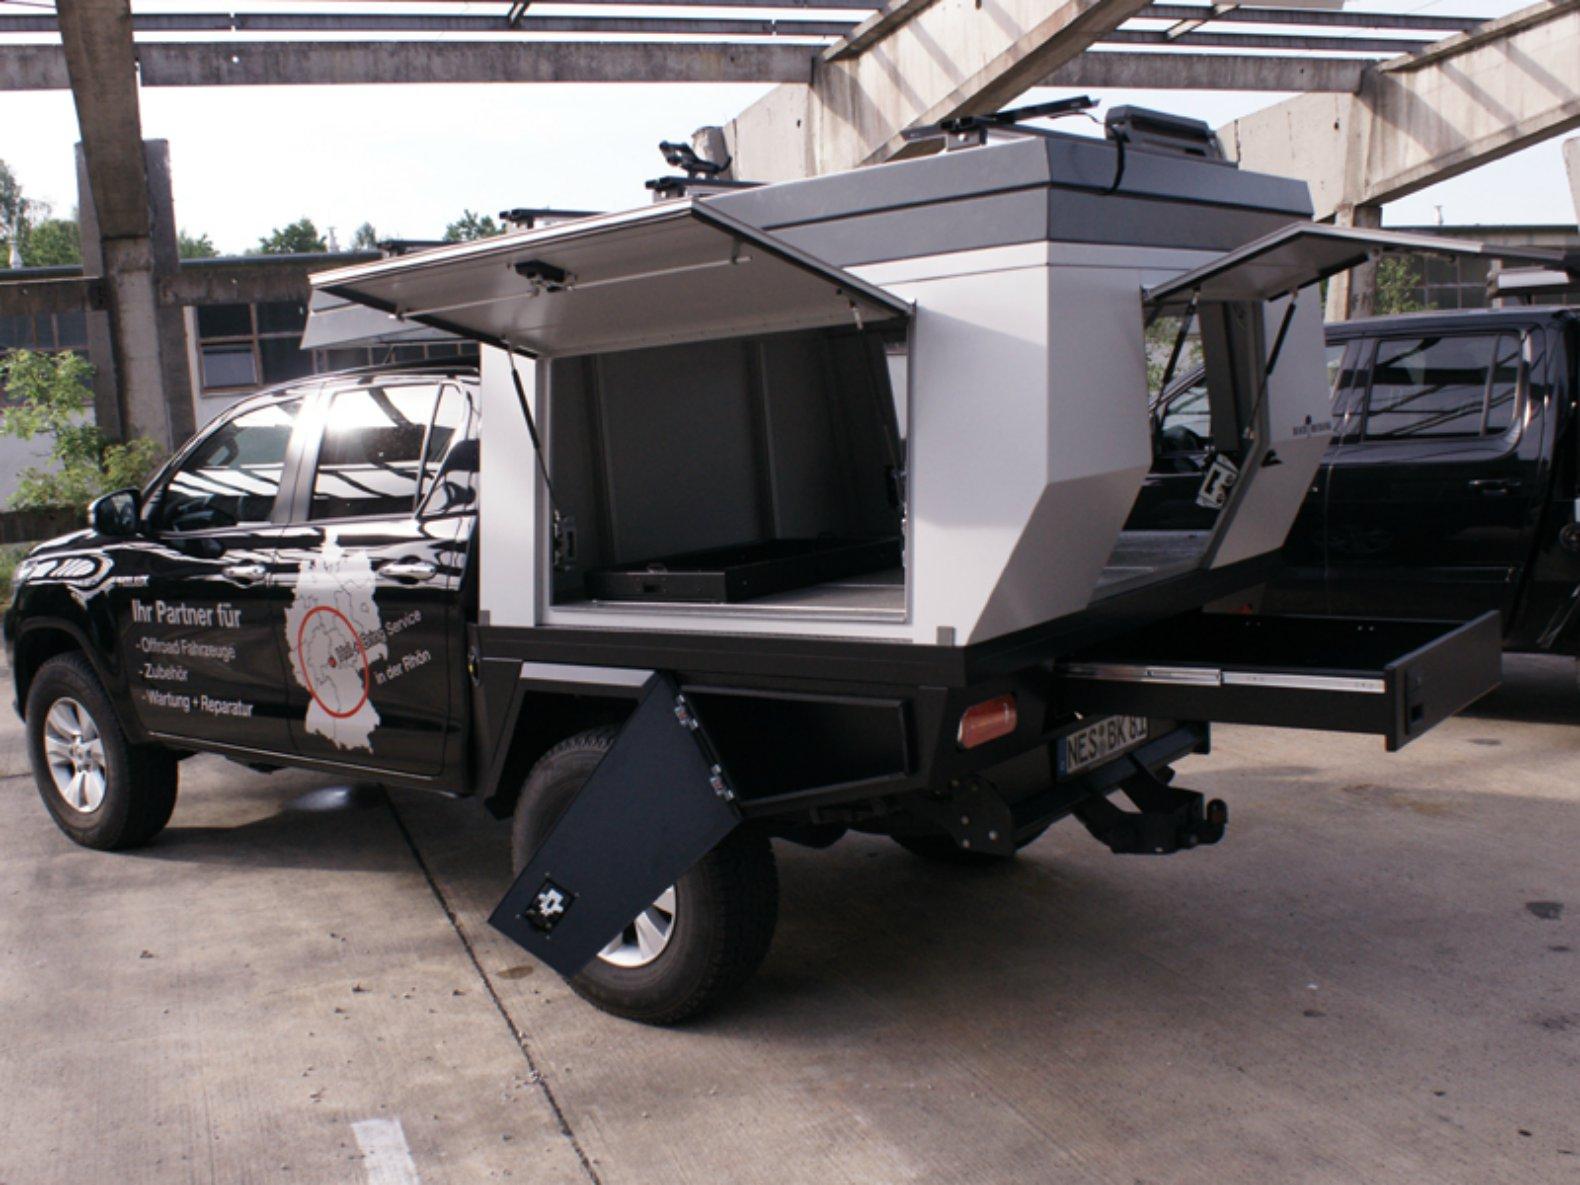 this pop up camper